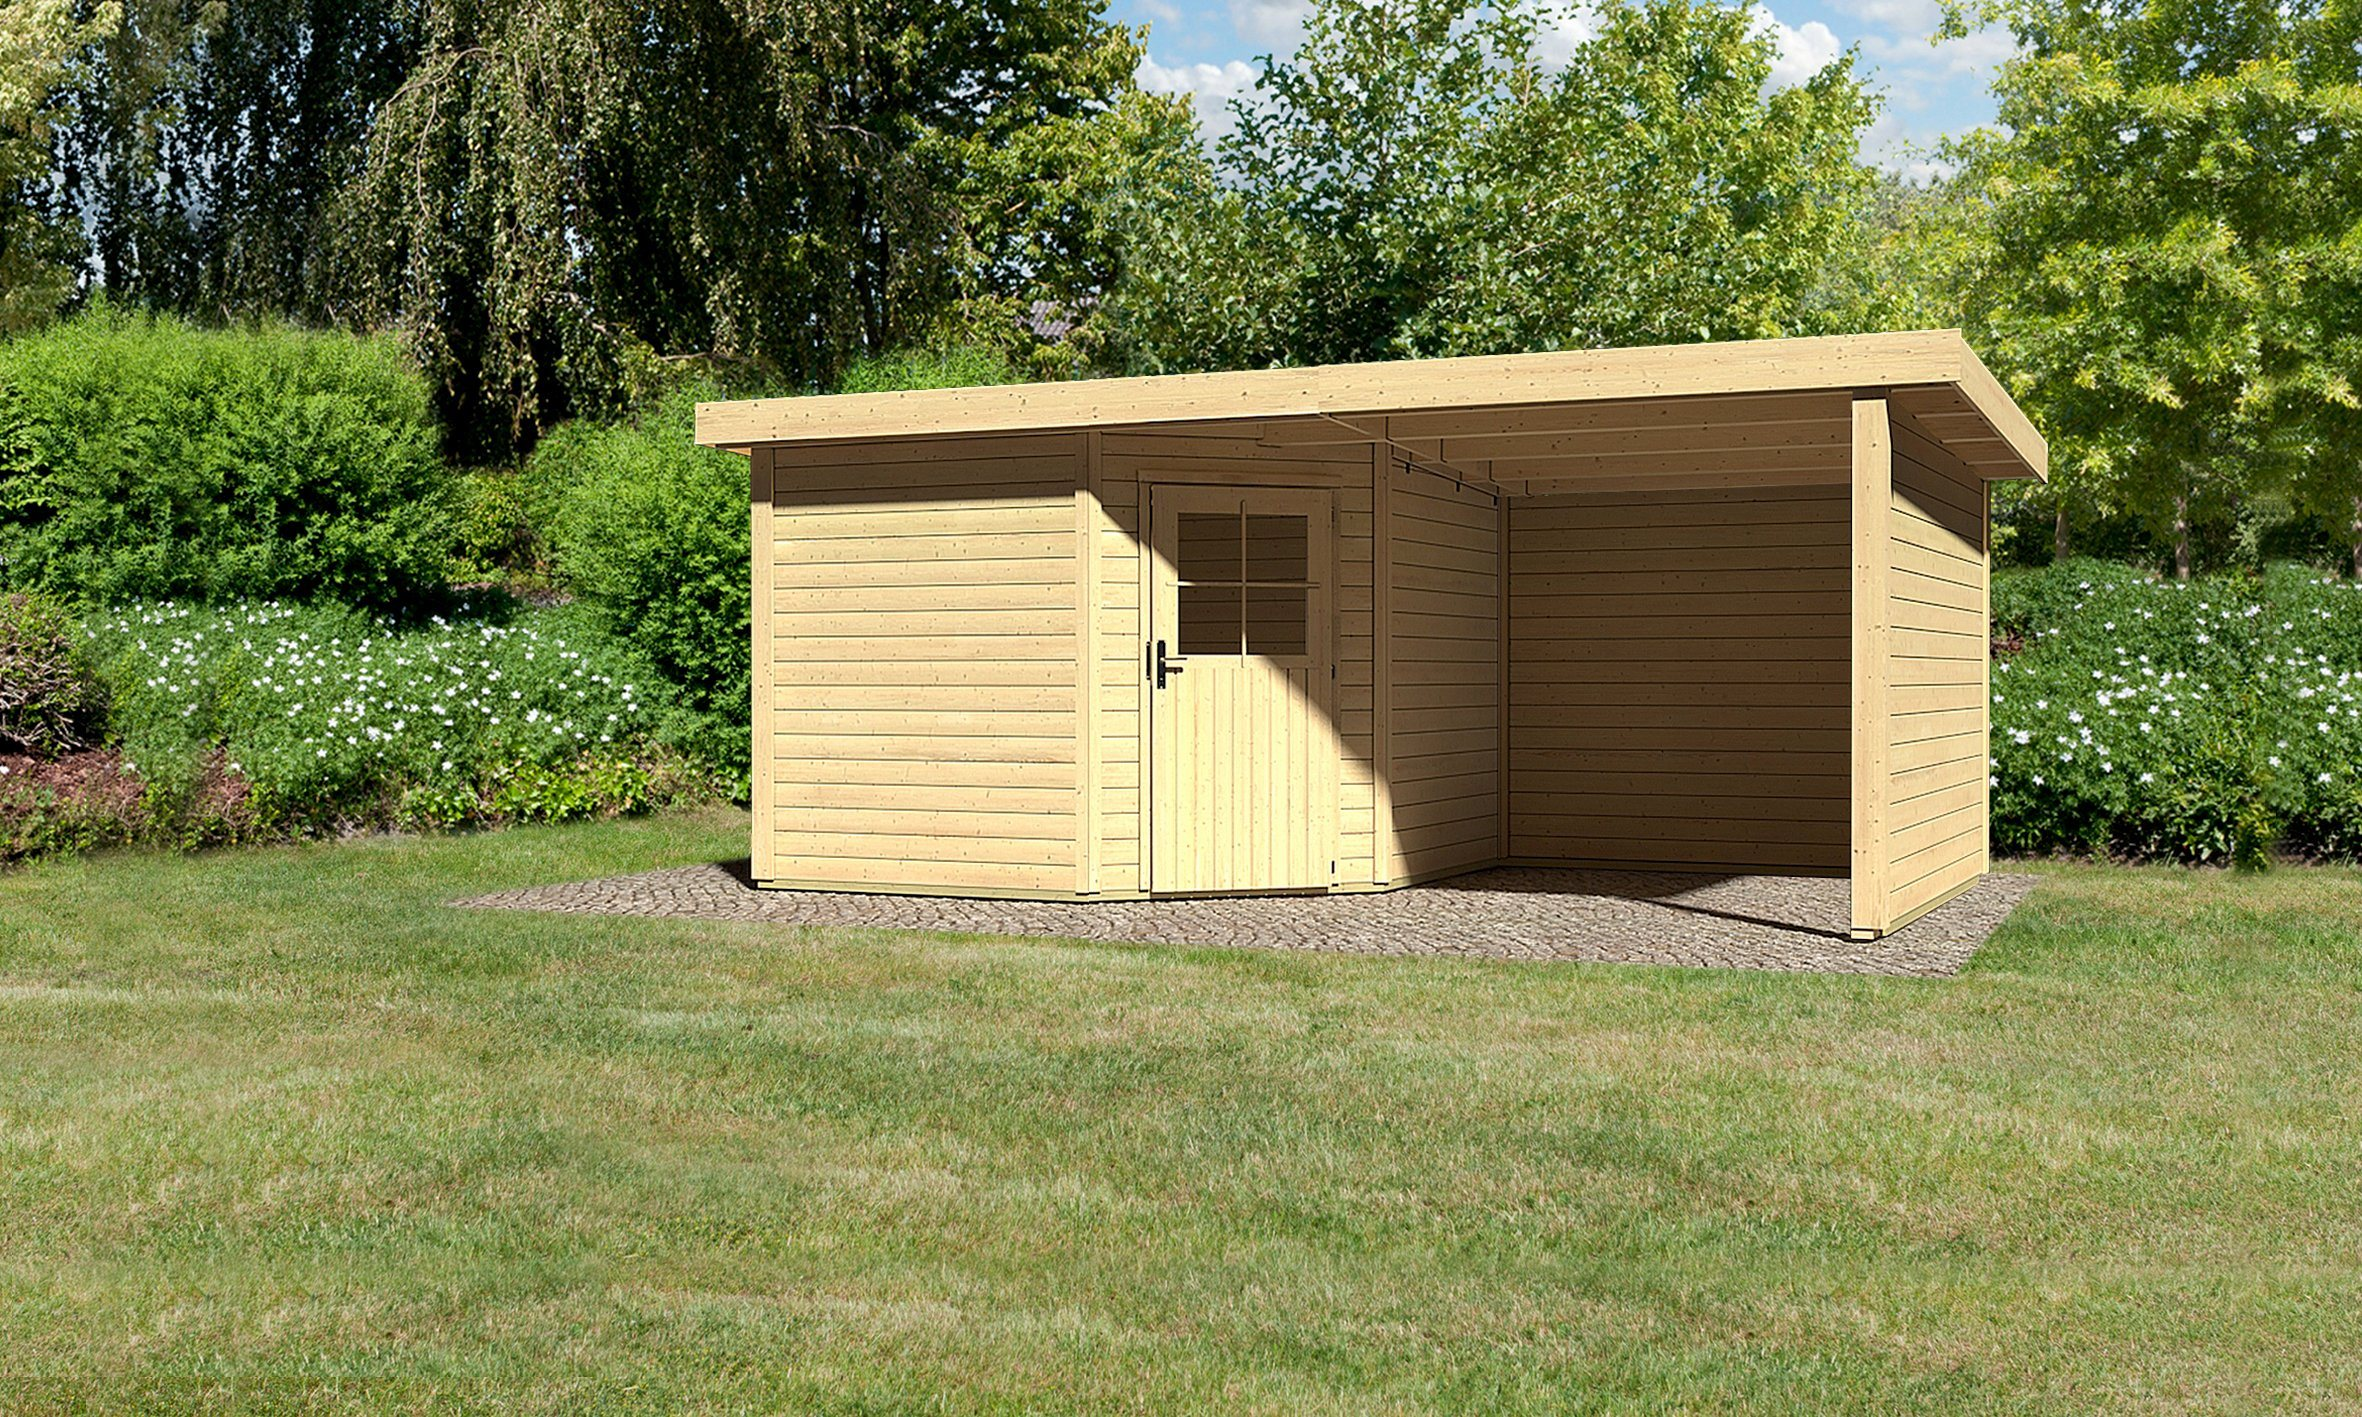 KARIBU Gartenhaus »Neuruppin 3«, Gesamtmaß (BxT): 509x303 cm, Inkl. Anbau | Garten > Gartenhäuser | Karibu